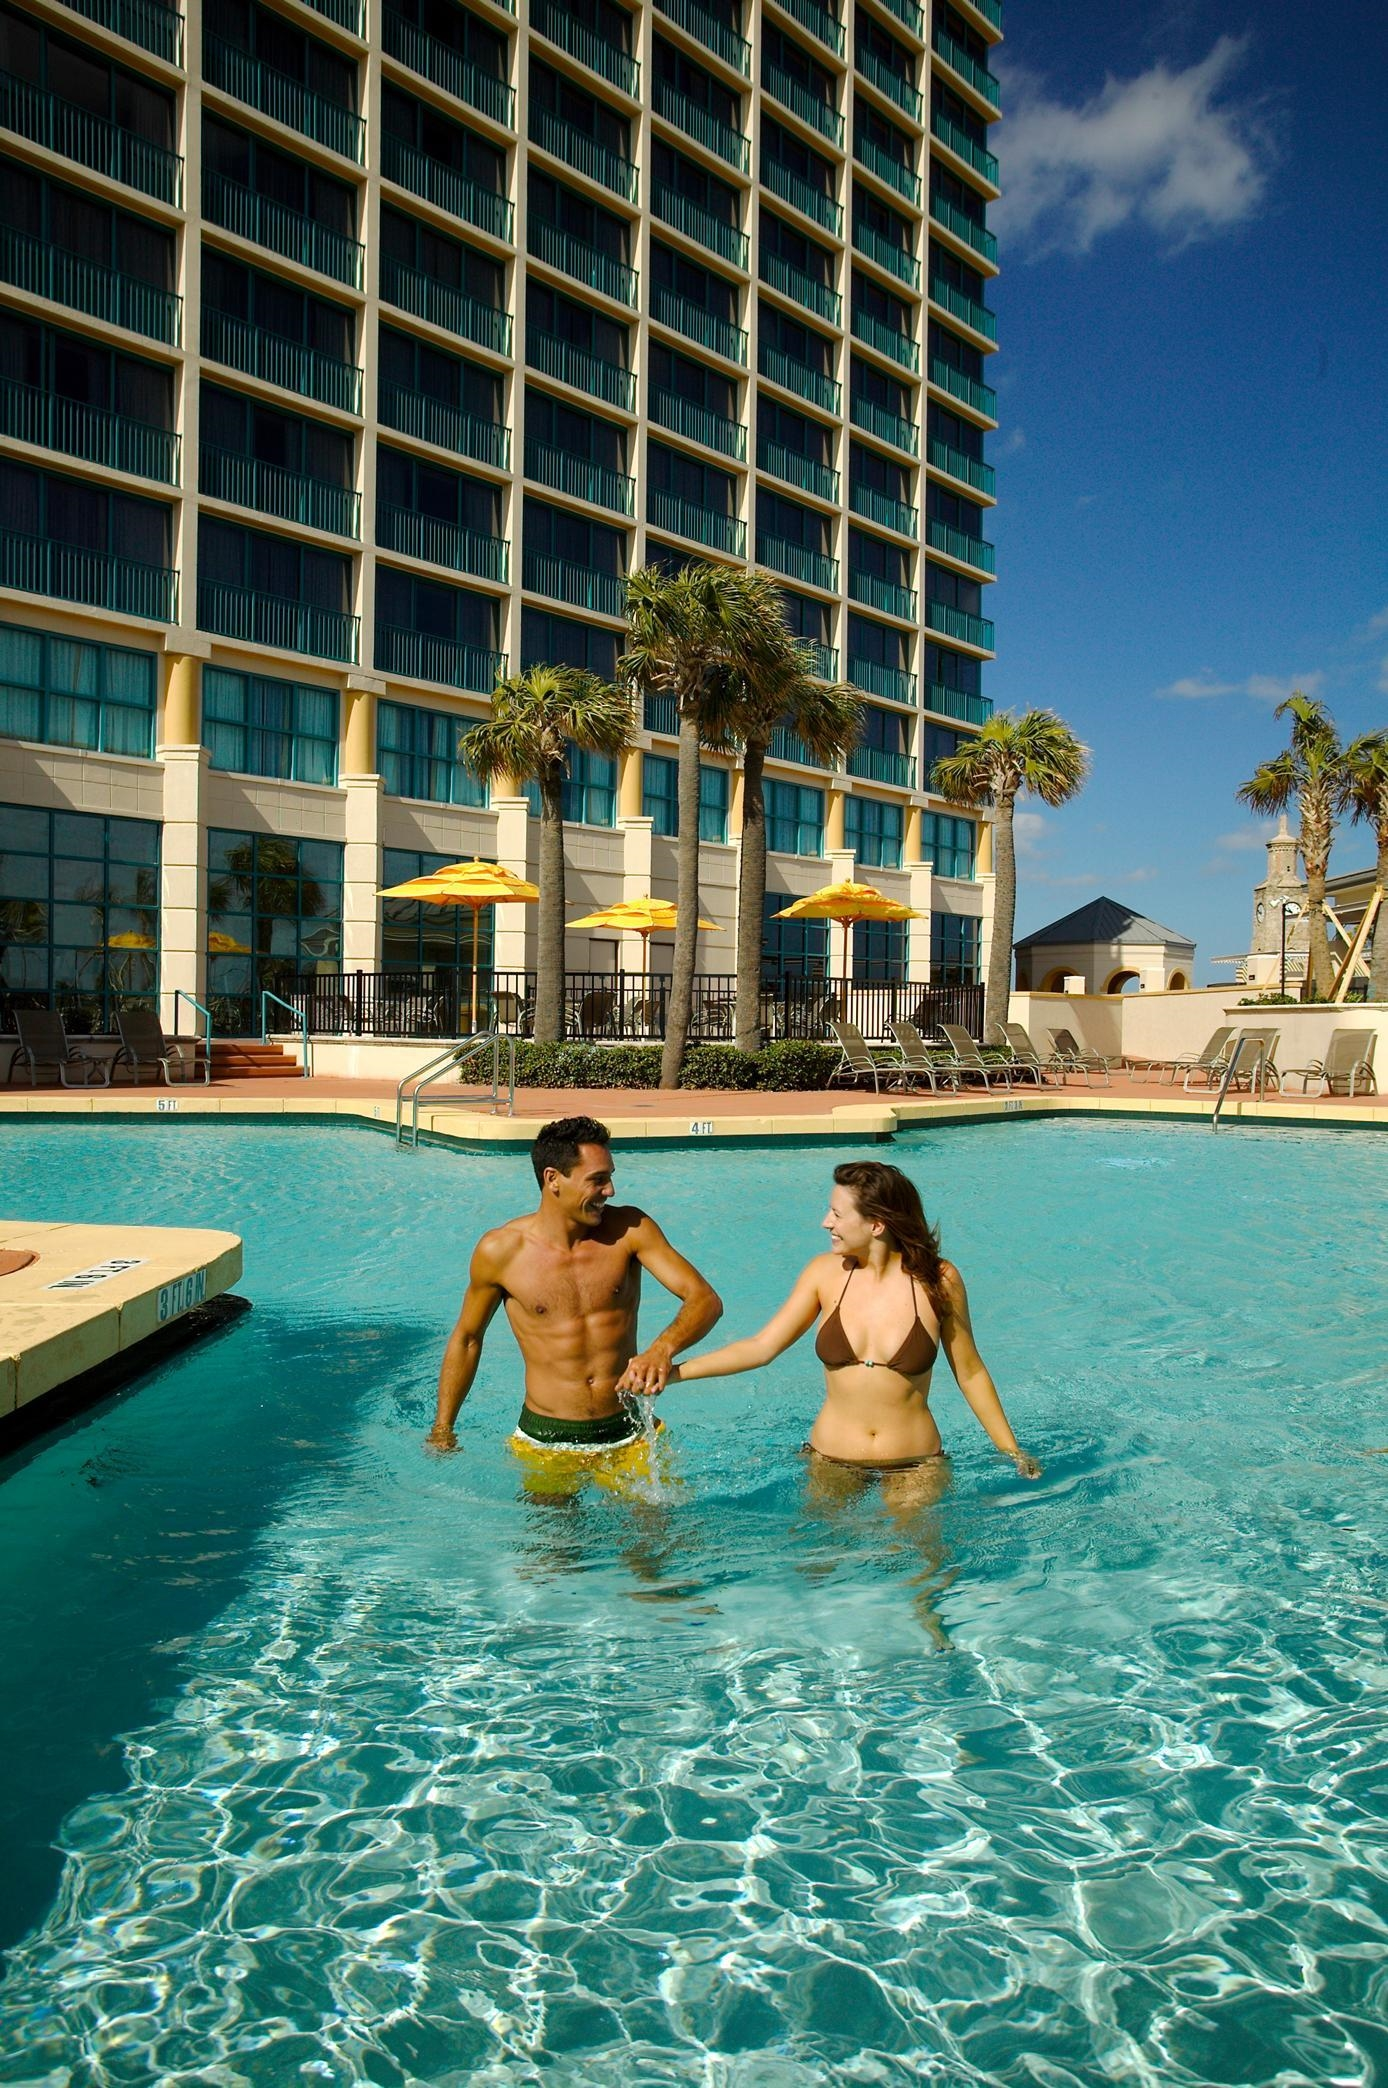 Plaza Resort And Spa Daytona Beach Fl Reviews